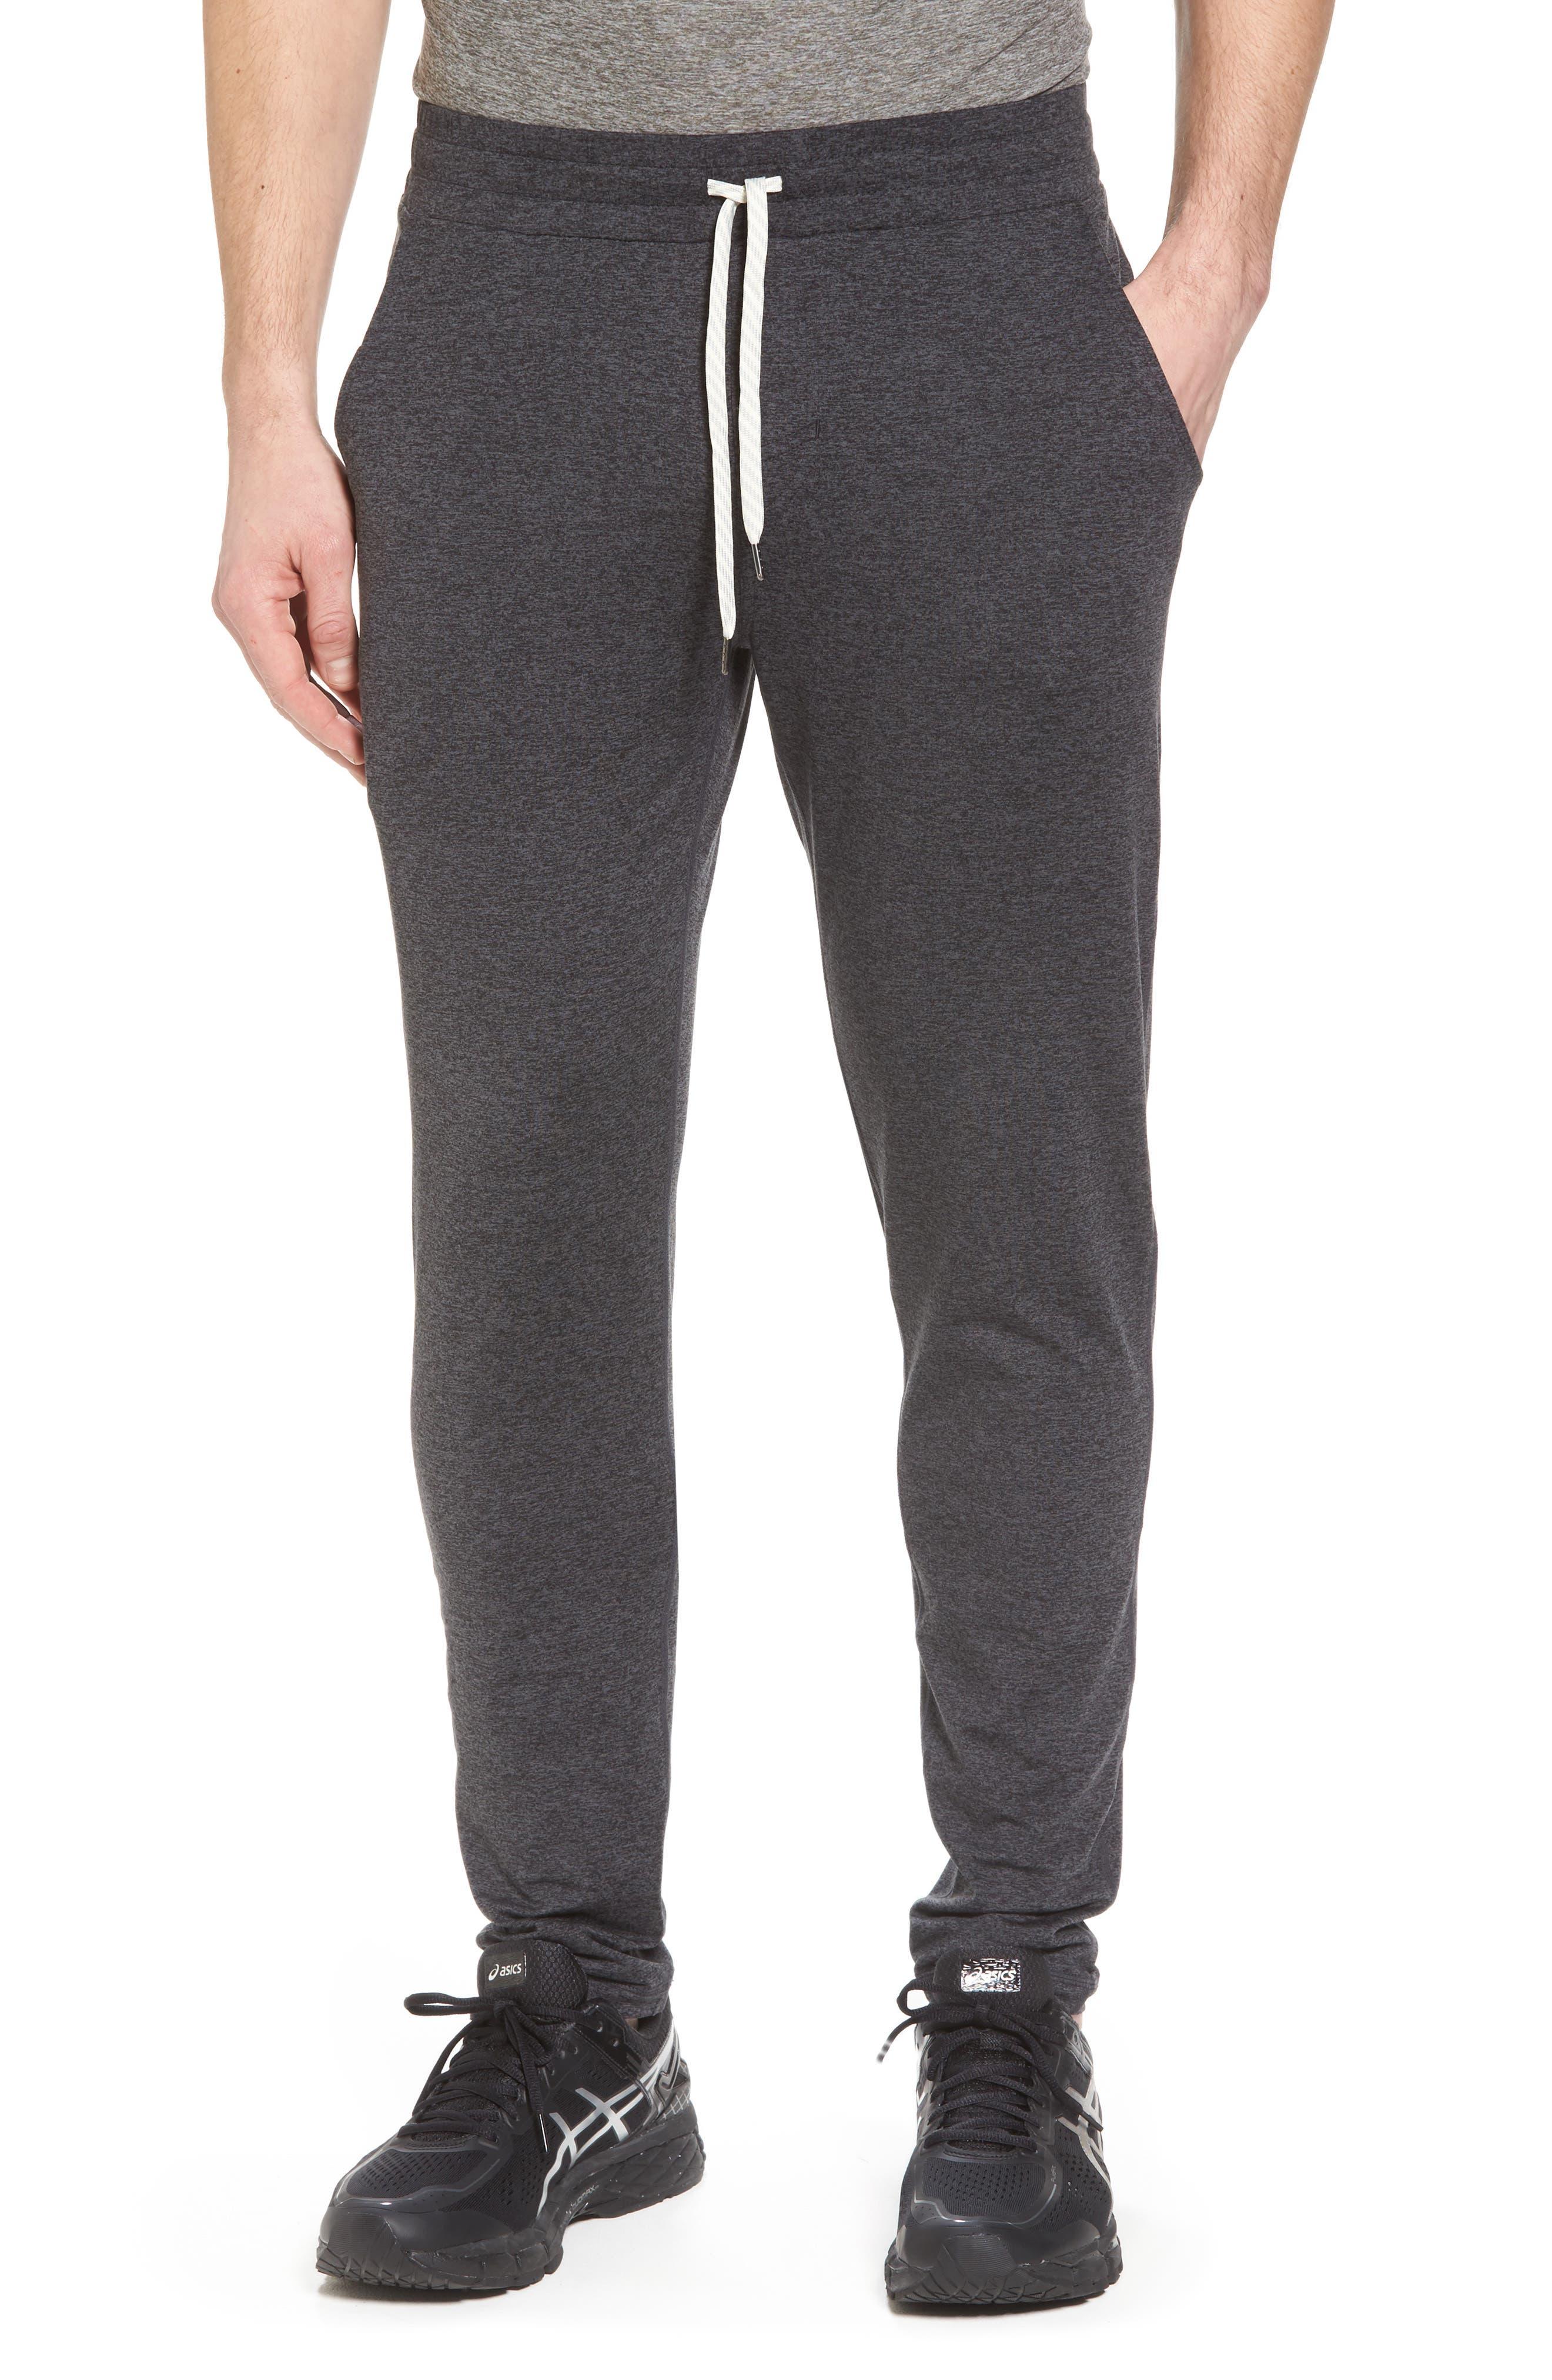 Ponto Jogger Pants,                         Main,                         color, HEATHER CHARCOAL